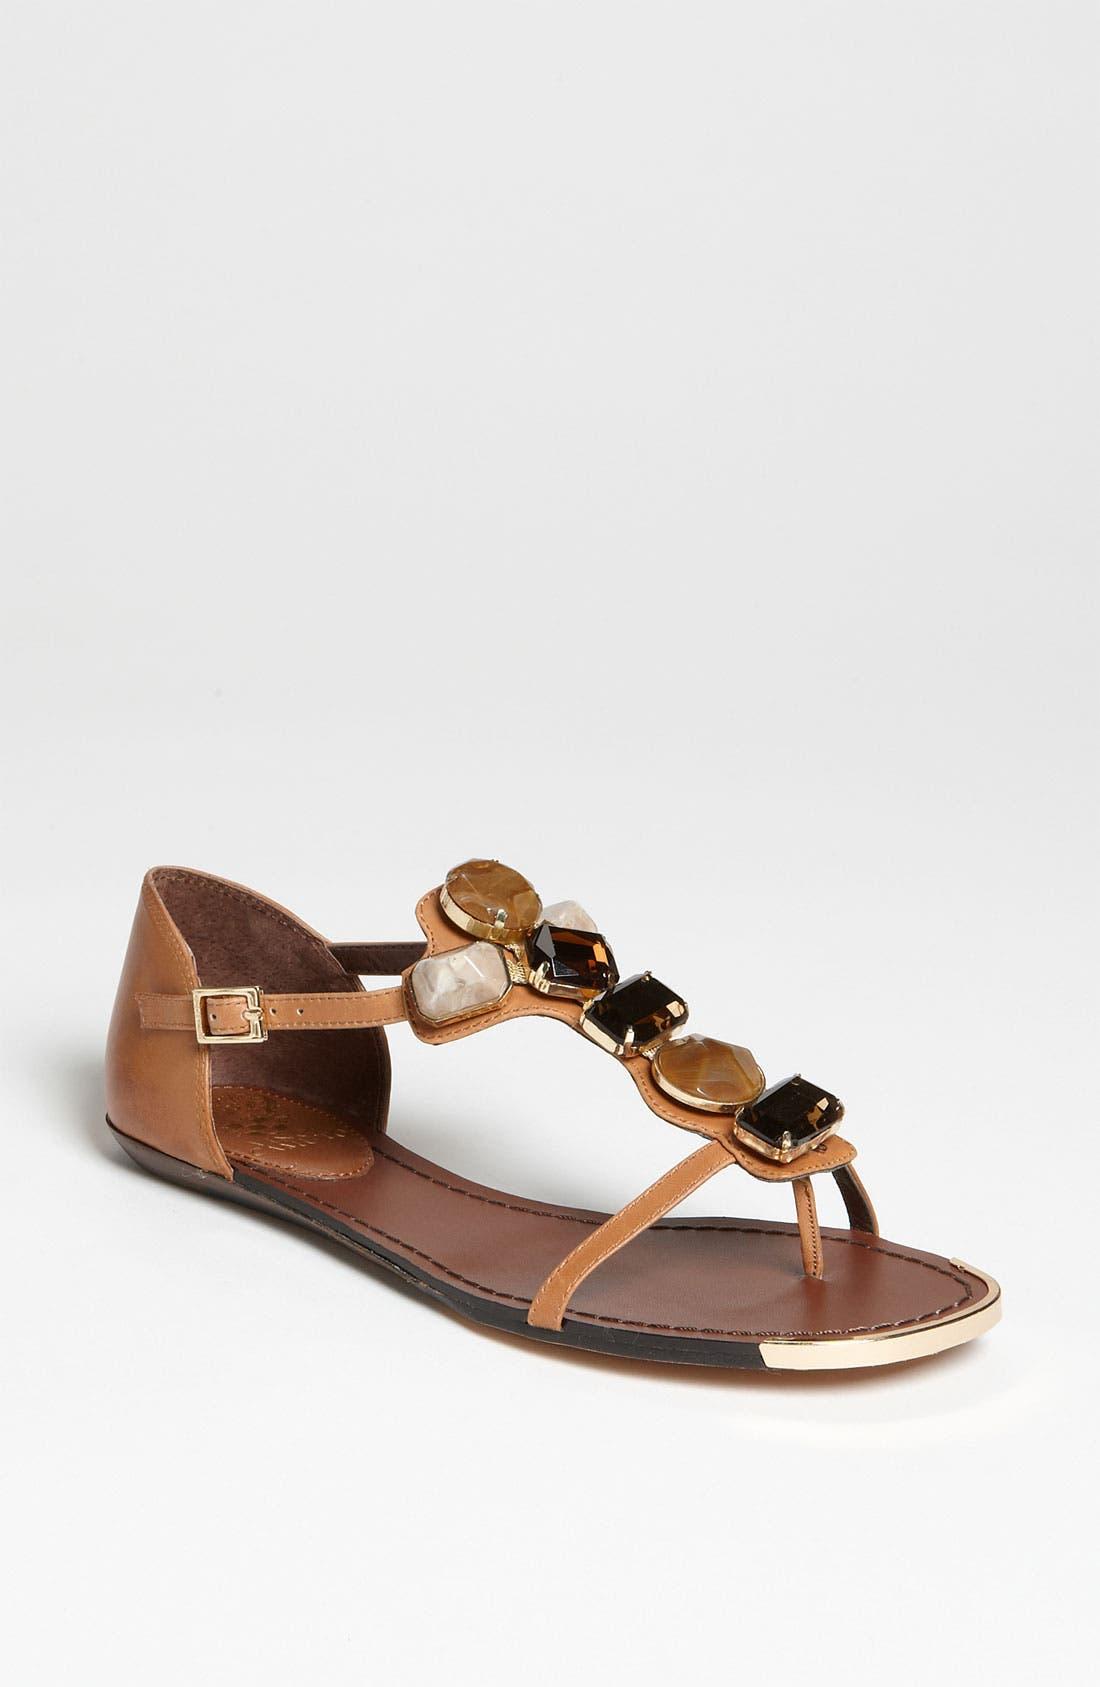 Alternate Image 1 Selected - Vince Camuto 'Kaila' Sandal